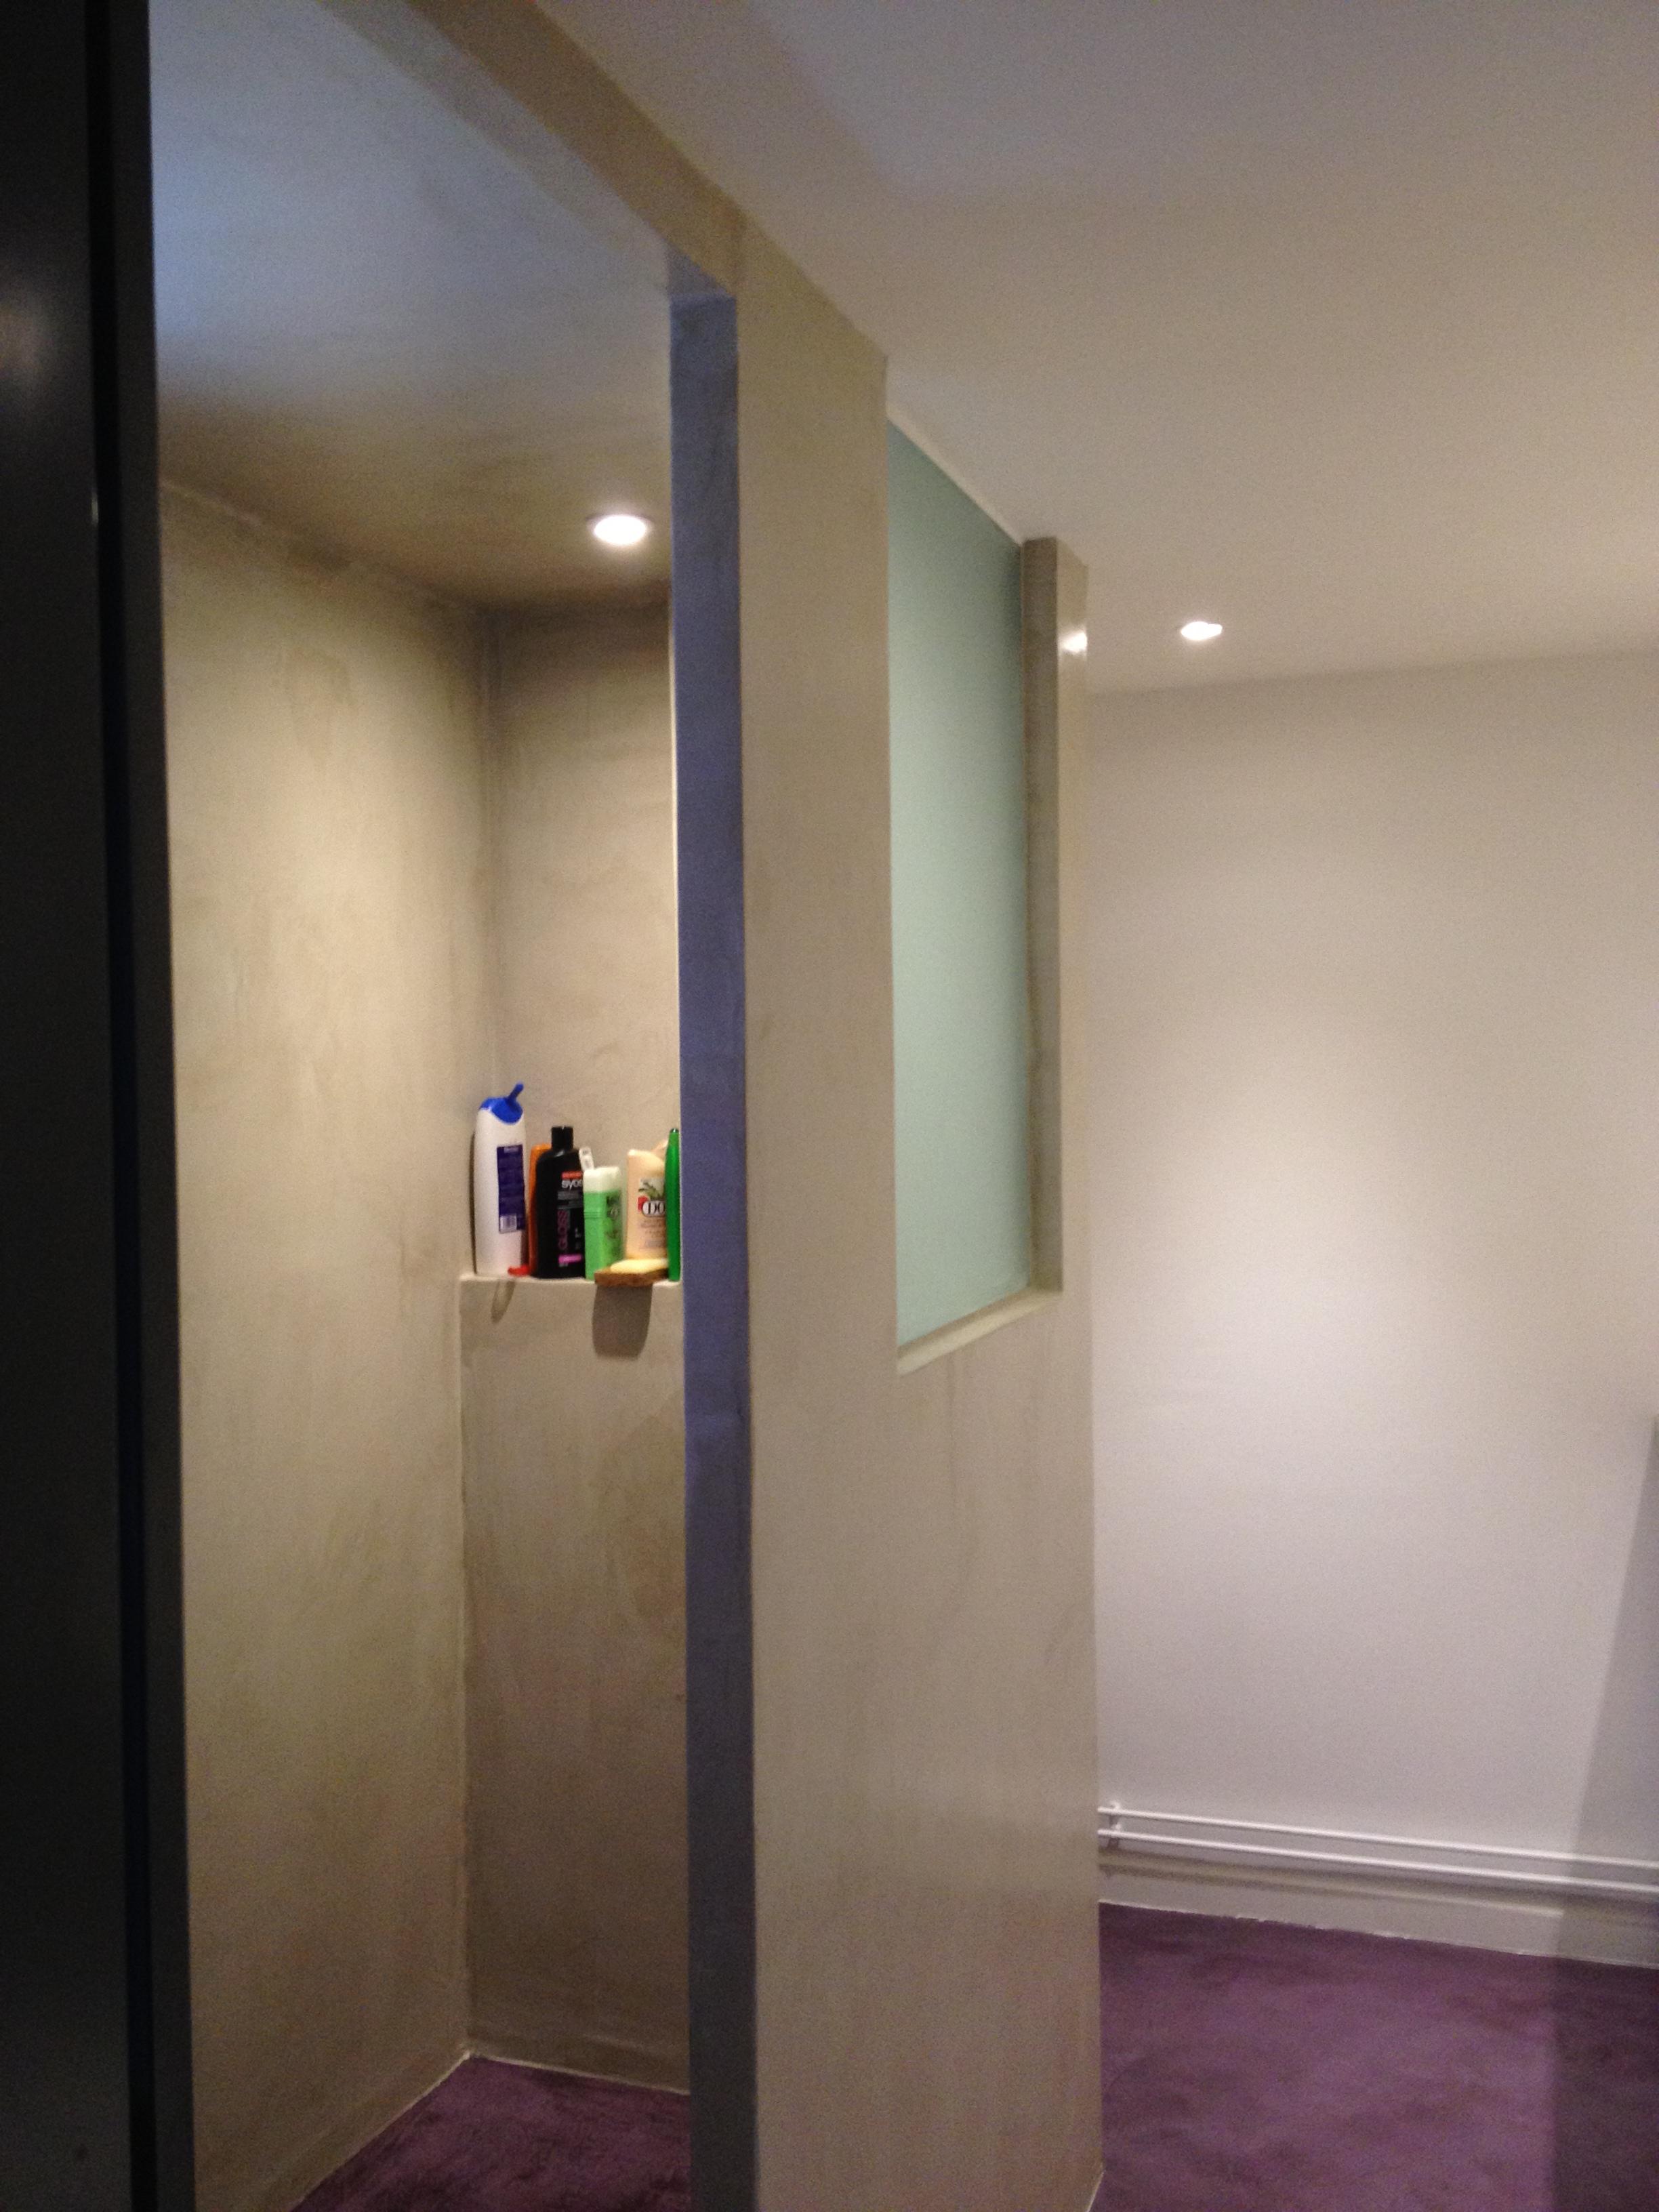 Salle de bain et béton ciré